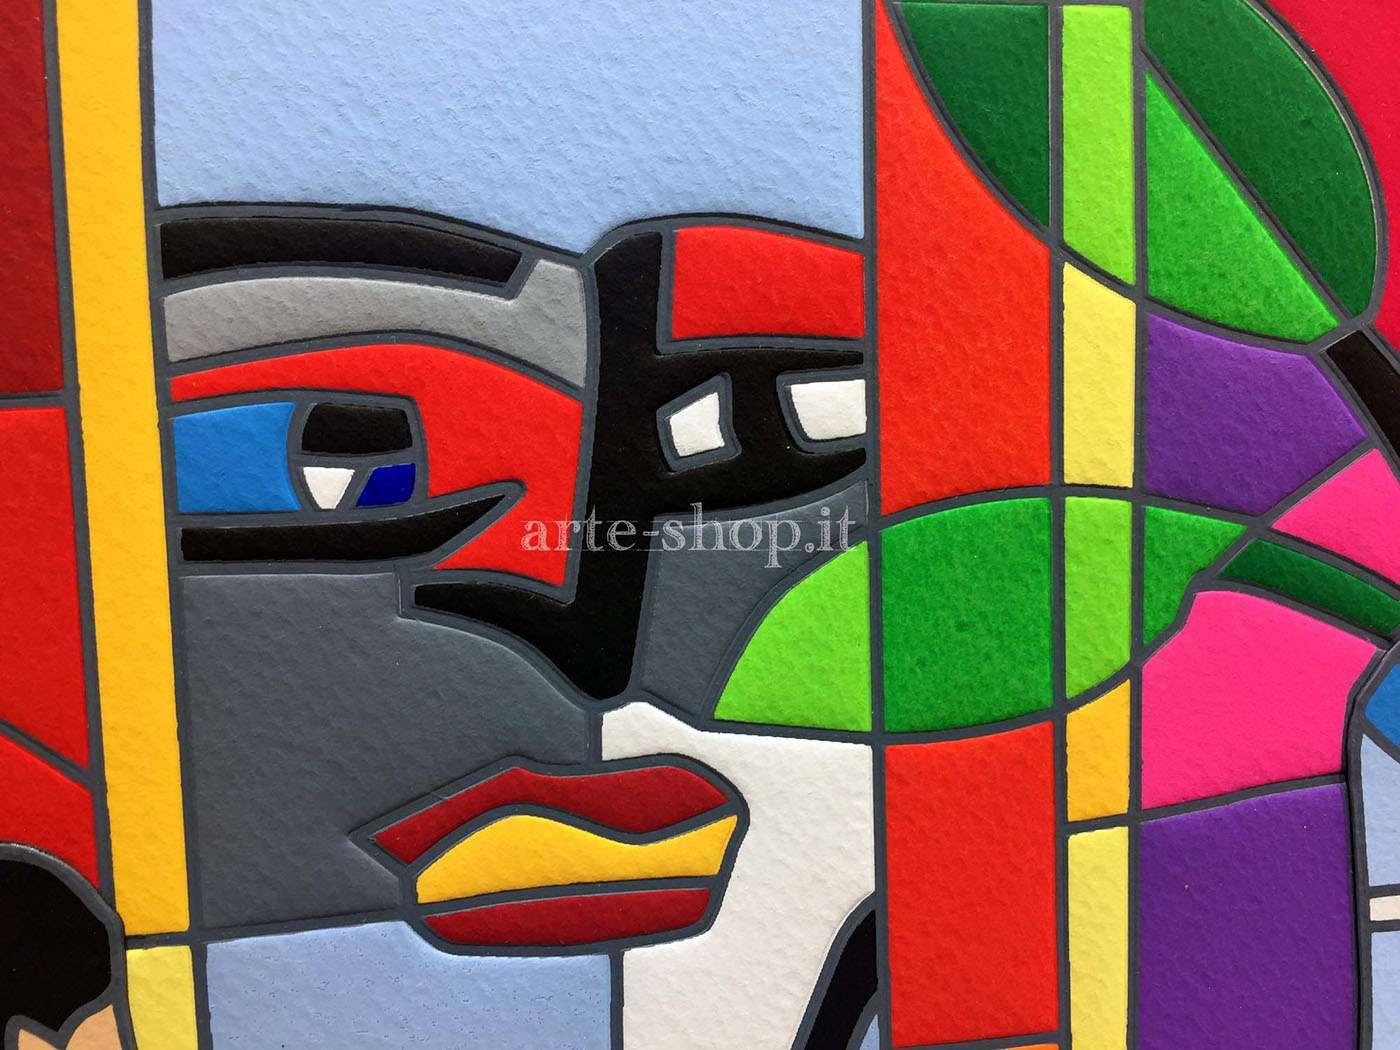 arte pentagono shop dettaglio numero 374